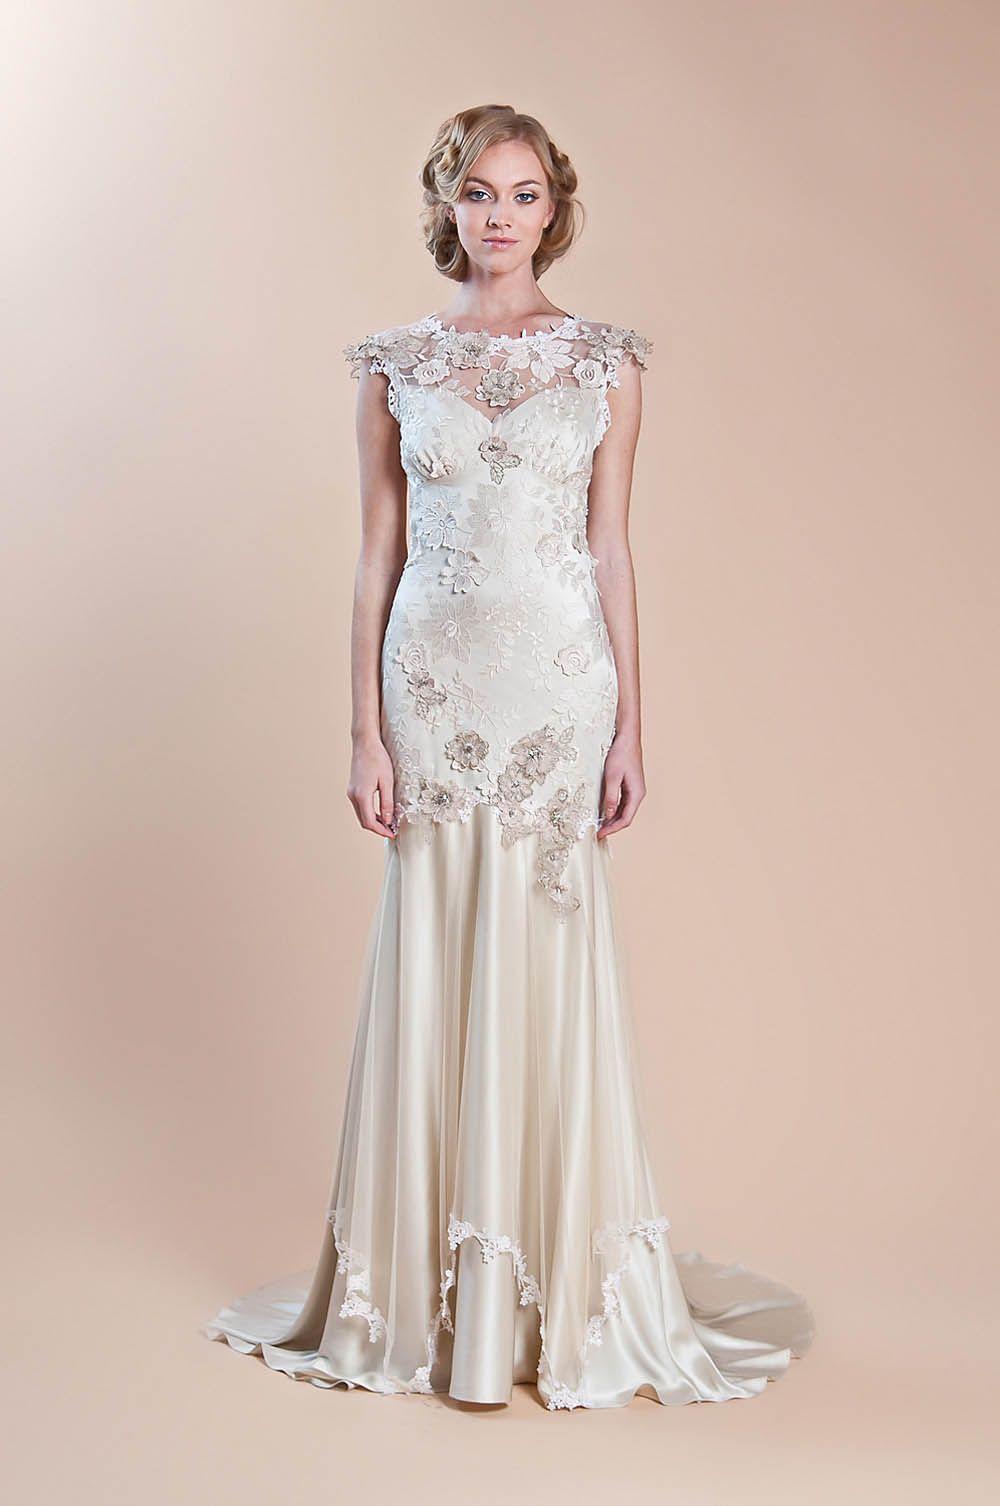 Evening dress 20s style wedding